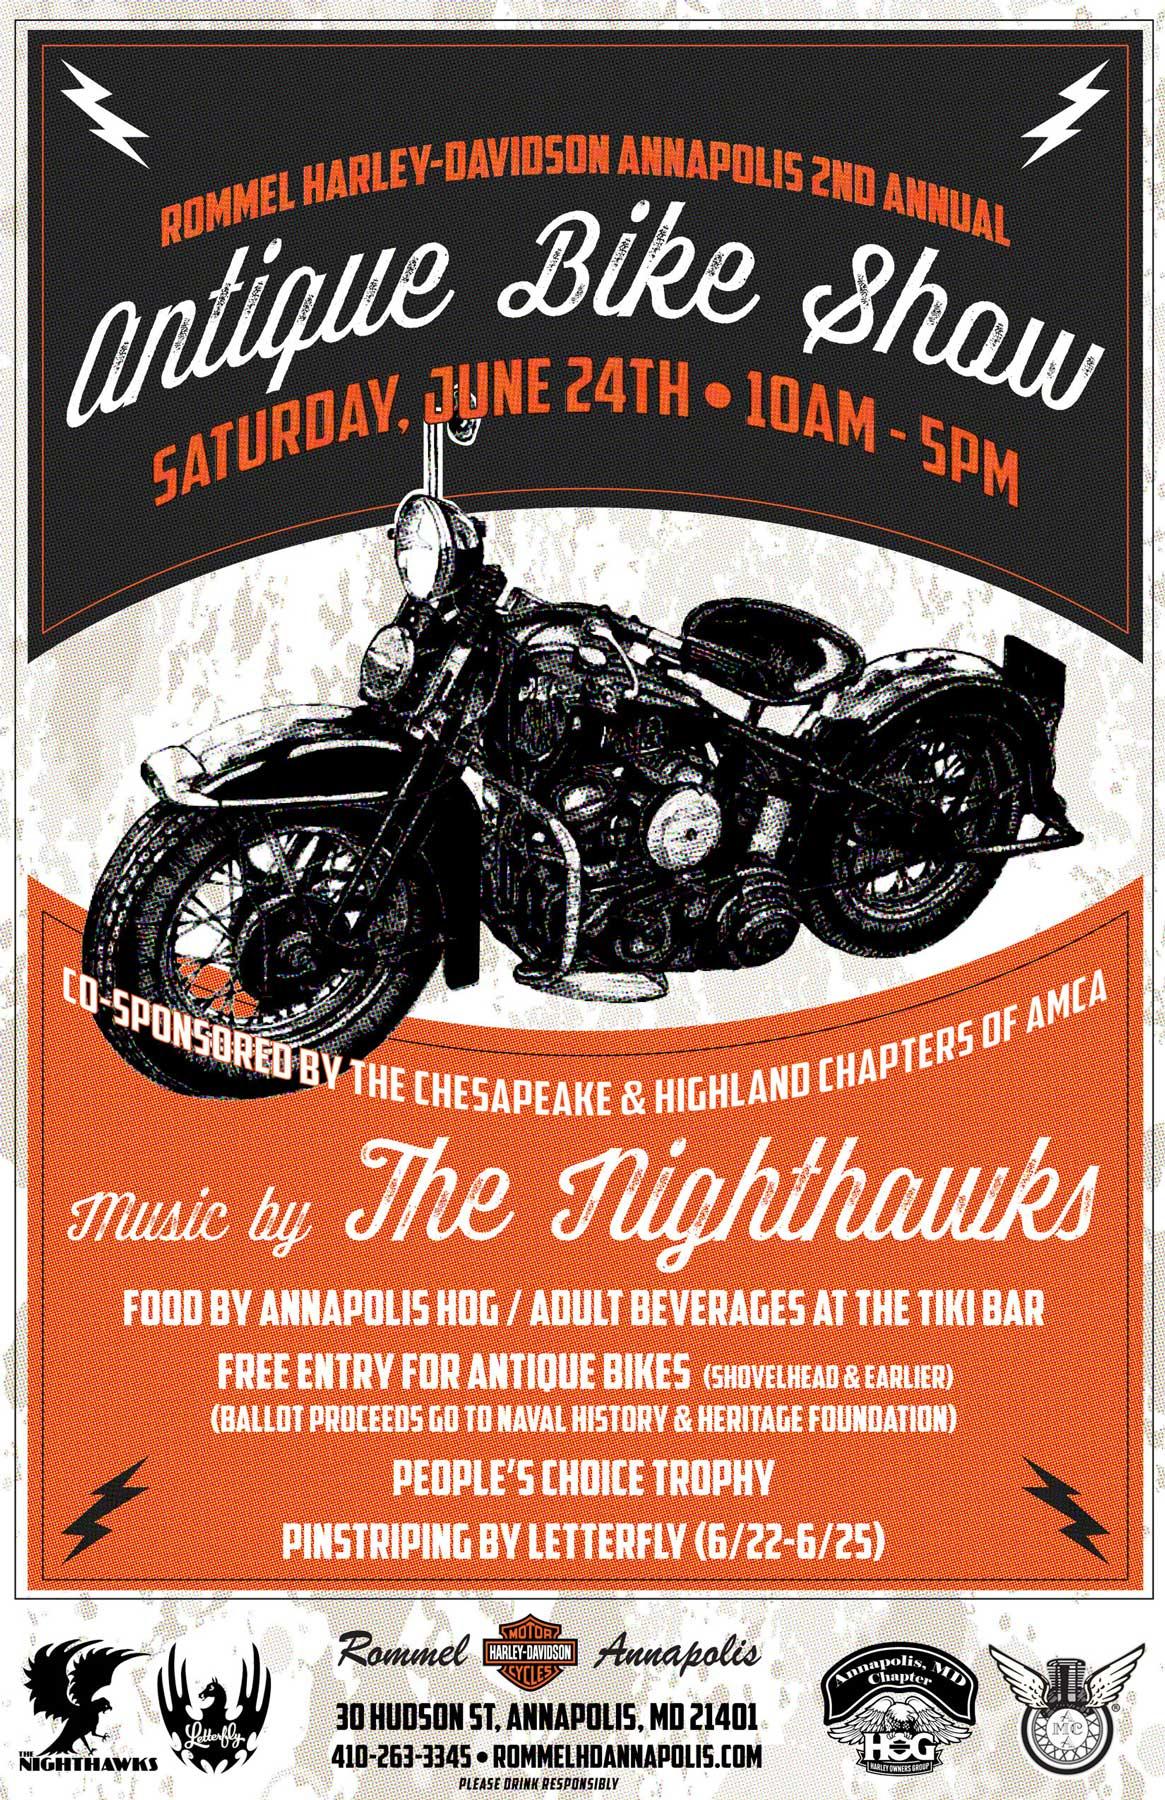 Rommel Harley-Davidson Annapolis 2nd Annual Antique Bike Show